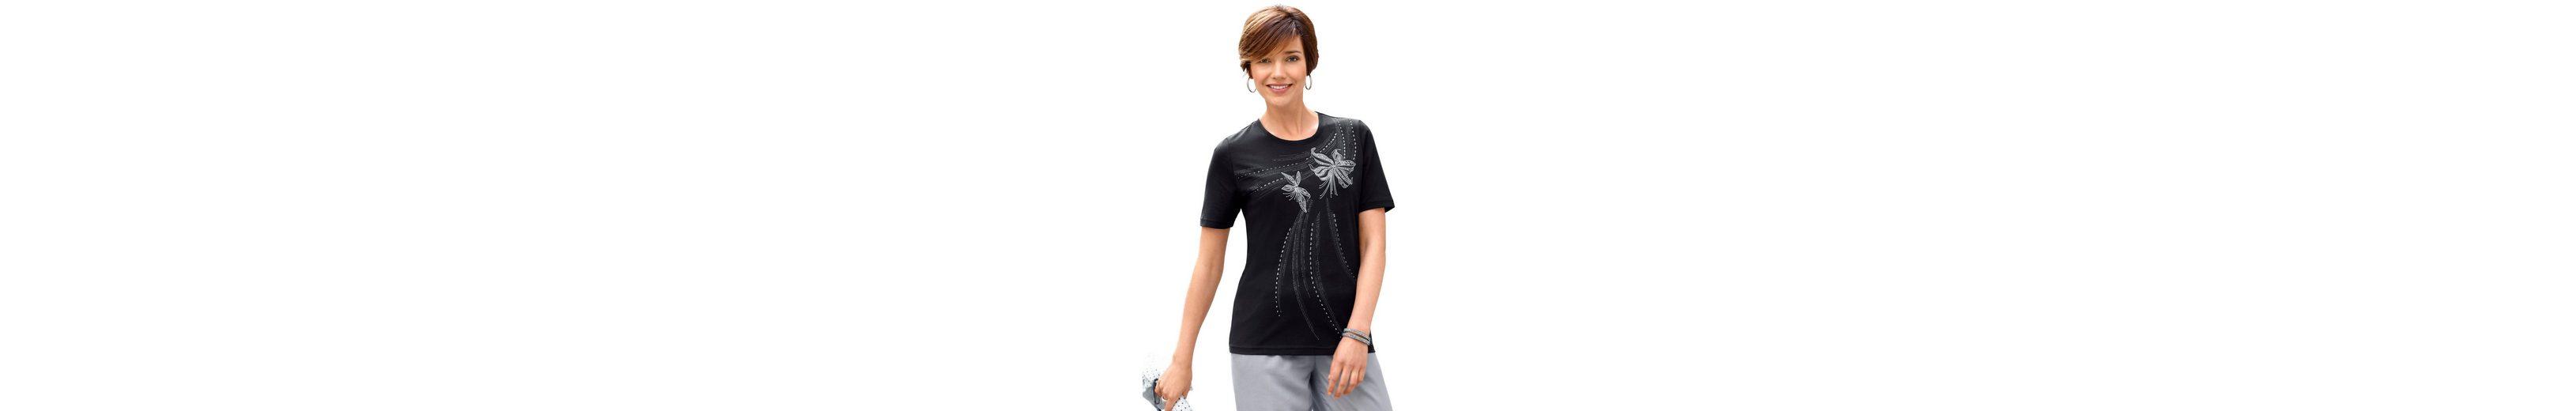 Classic Basics Shirt mit platziertem Printmotiv Größte Anbieter Günstiger Preis Vx1i7